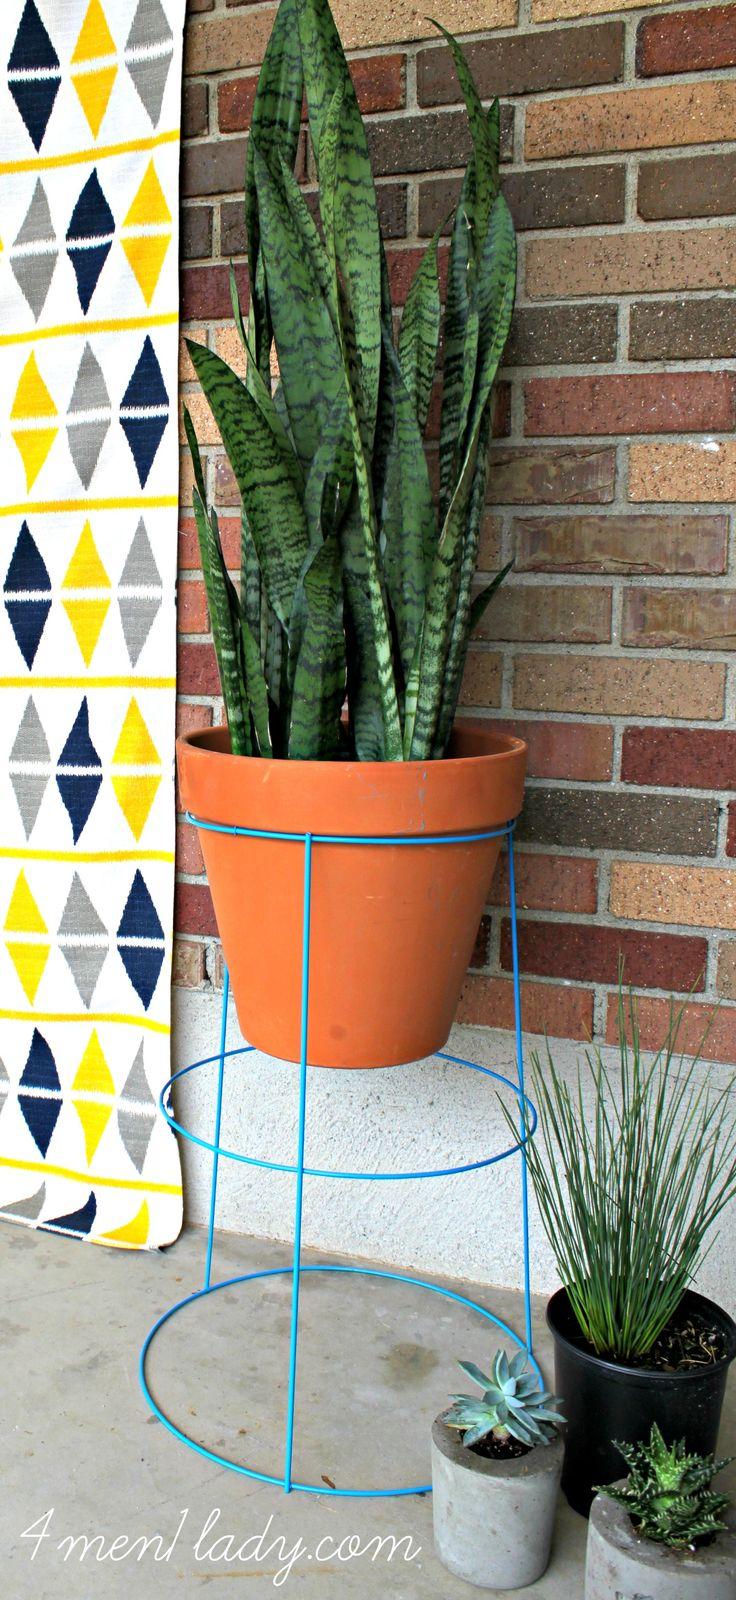 DIY Tomato Cage Pot Planter. - 4 Men 1 Lady